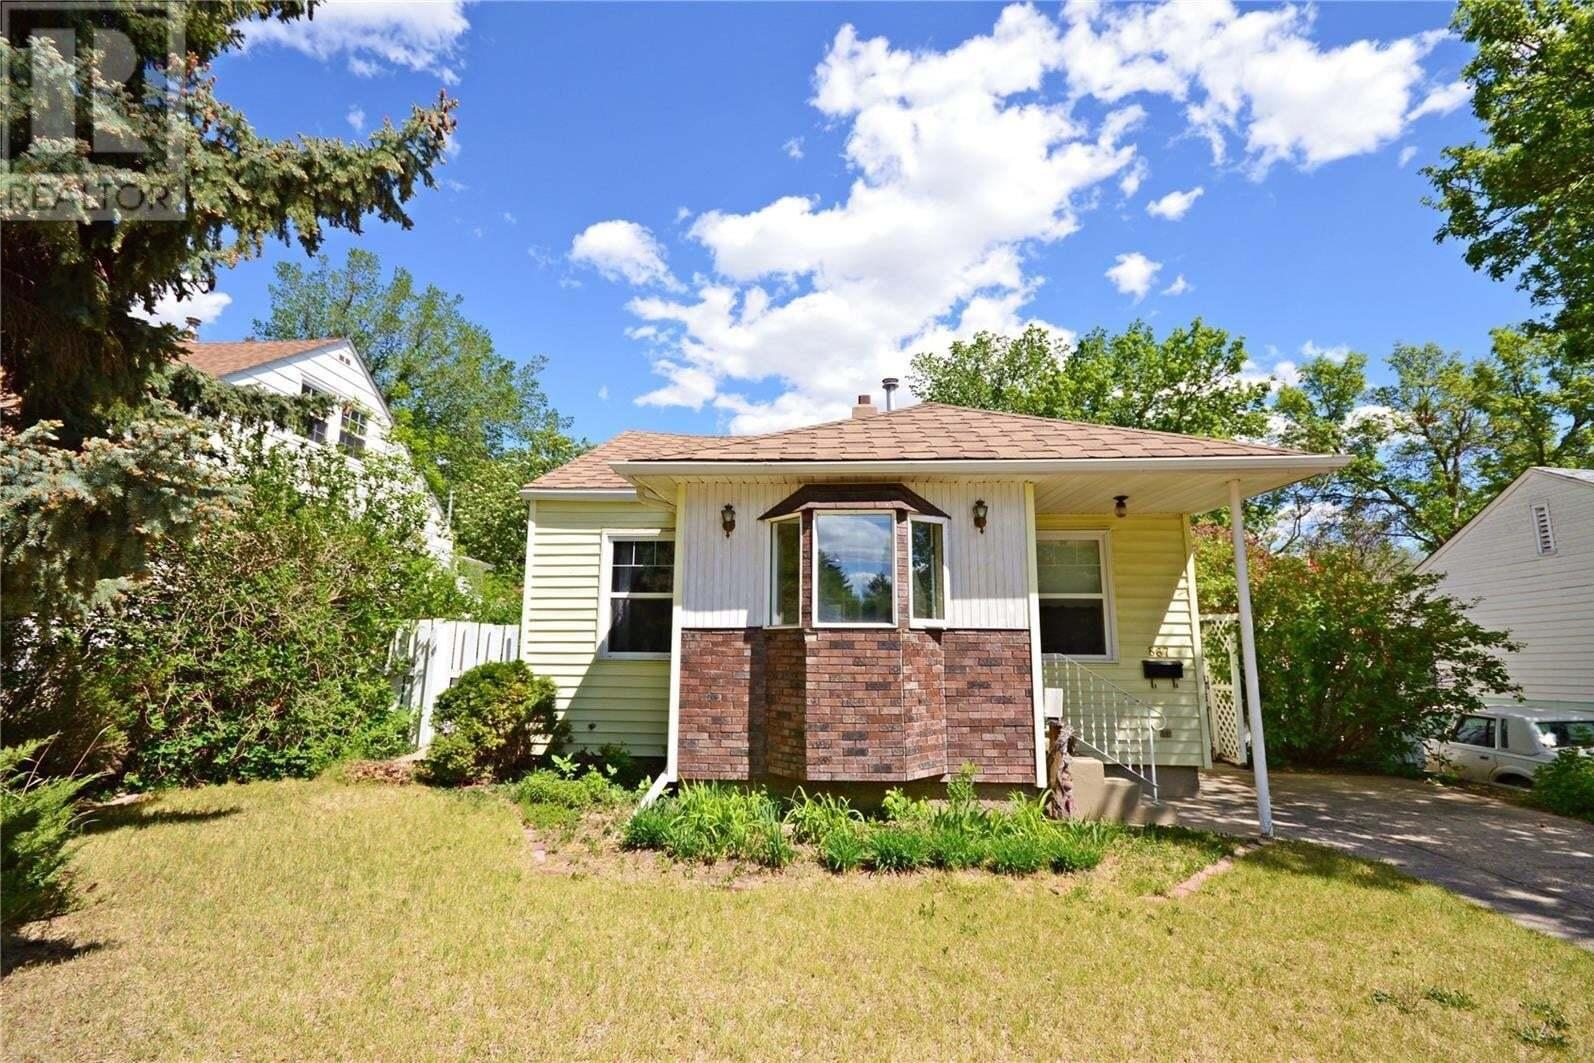 House for sale at 867 Monk Ave Moose Jaw Saskatchewan - MLS: SK810657